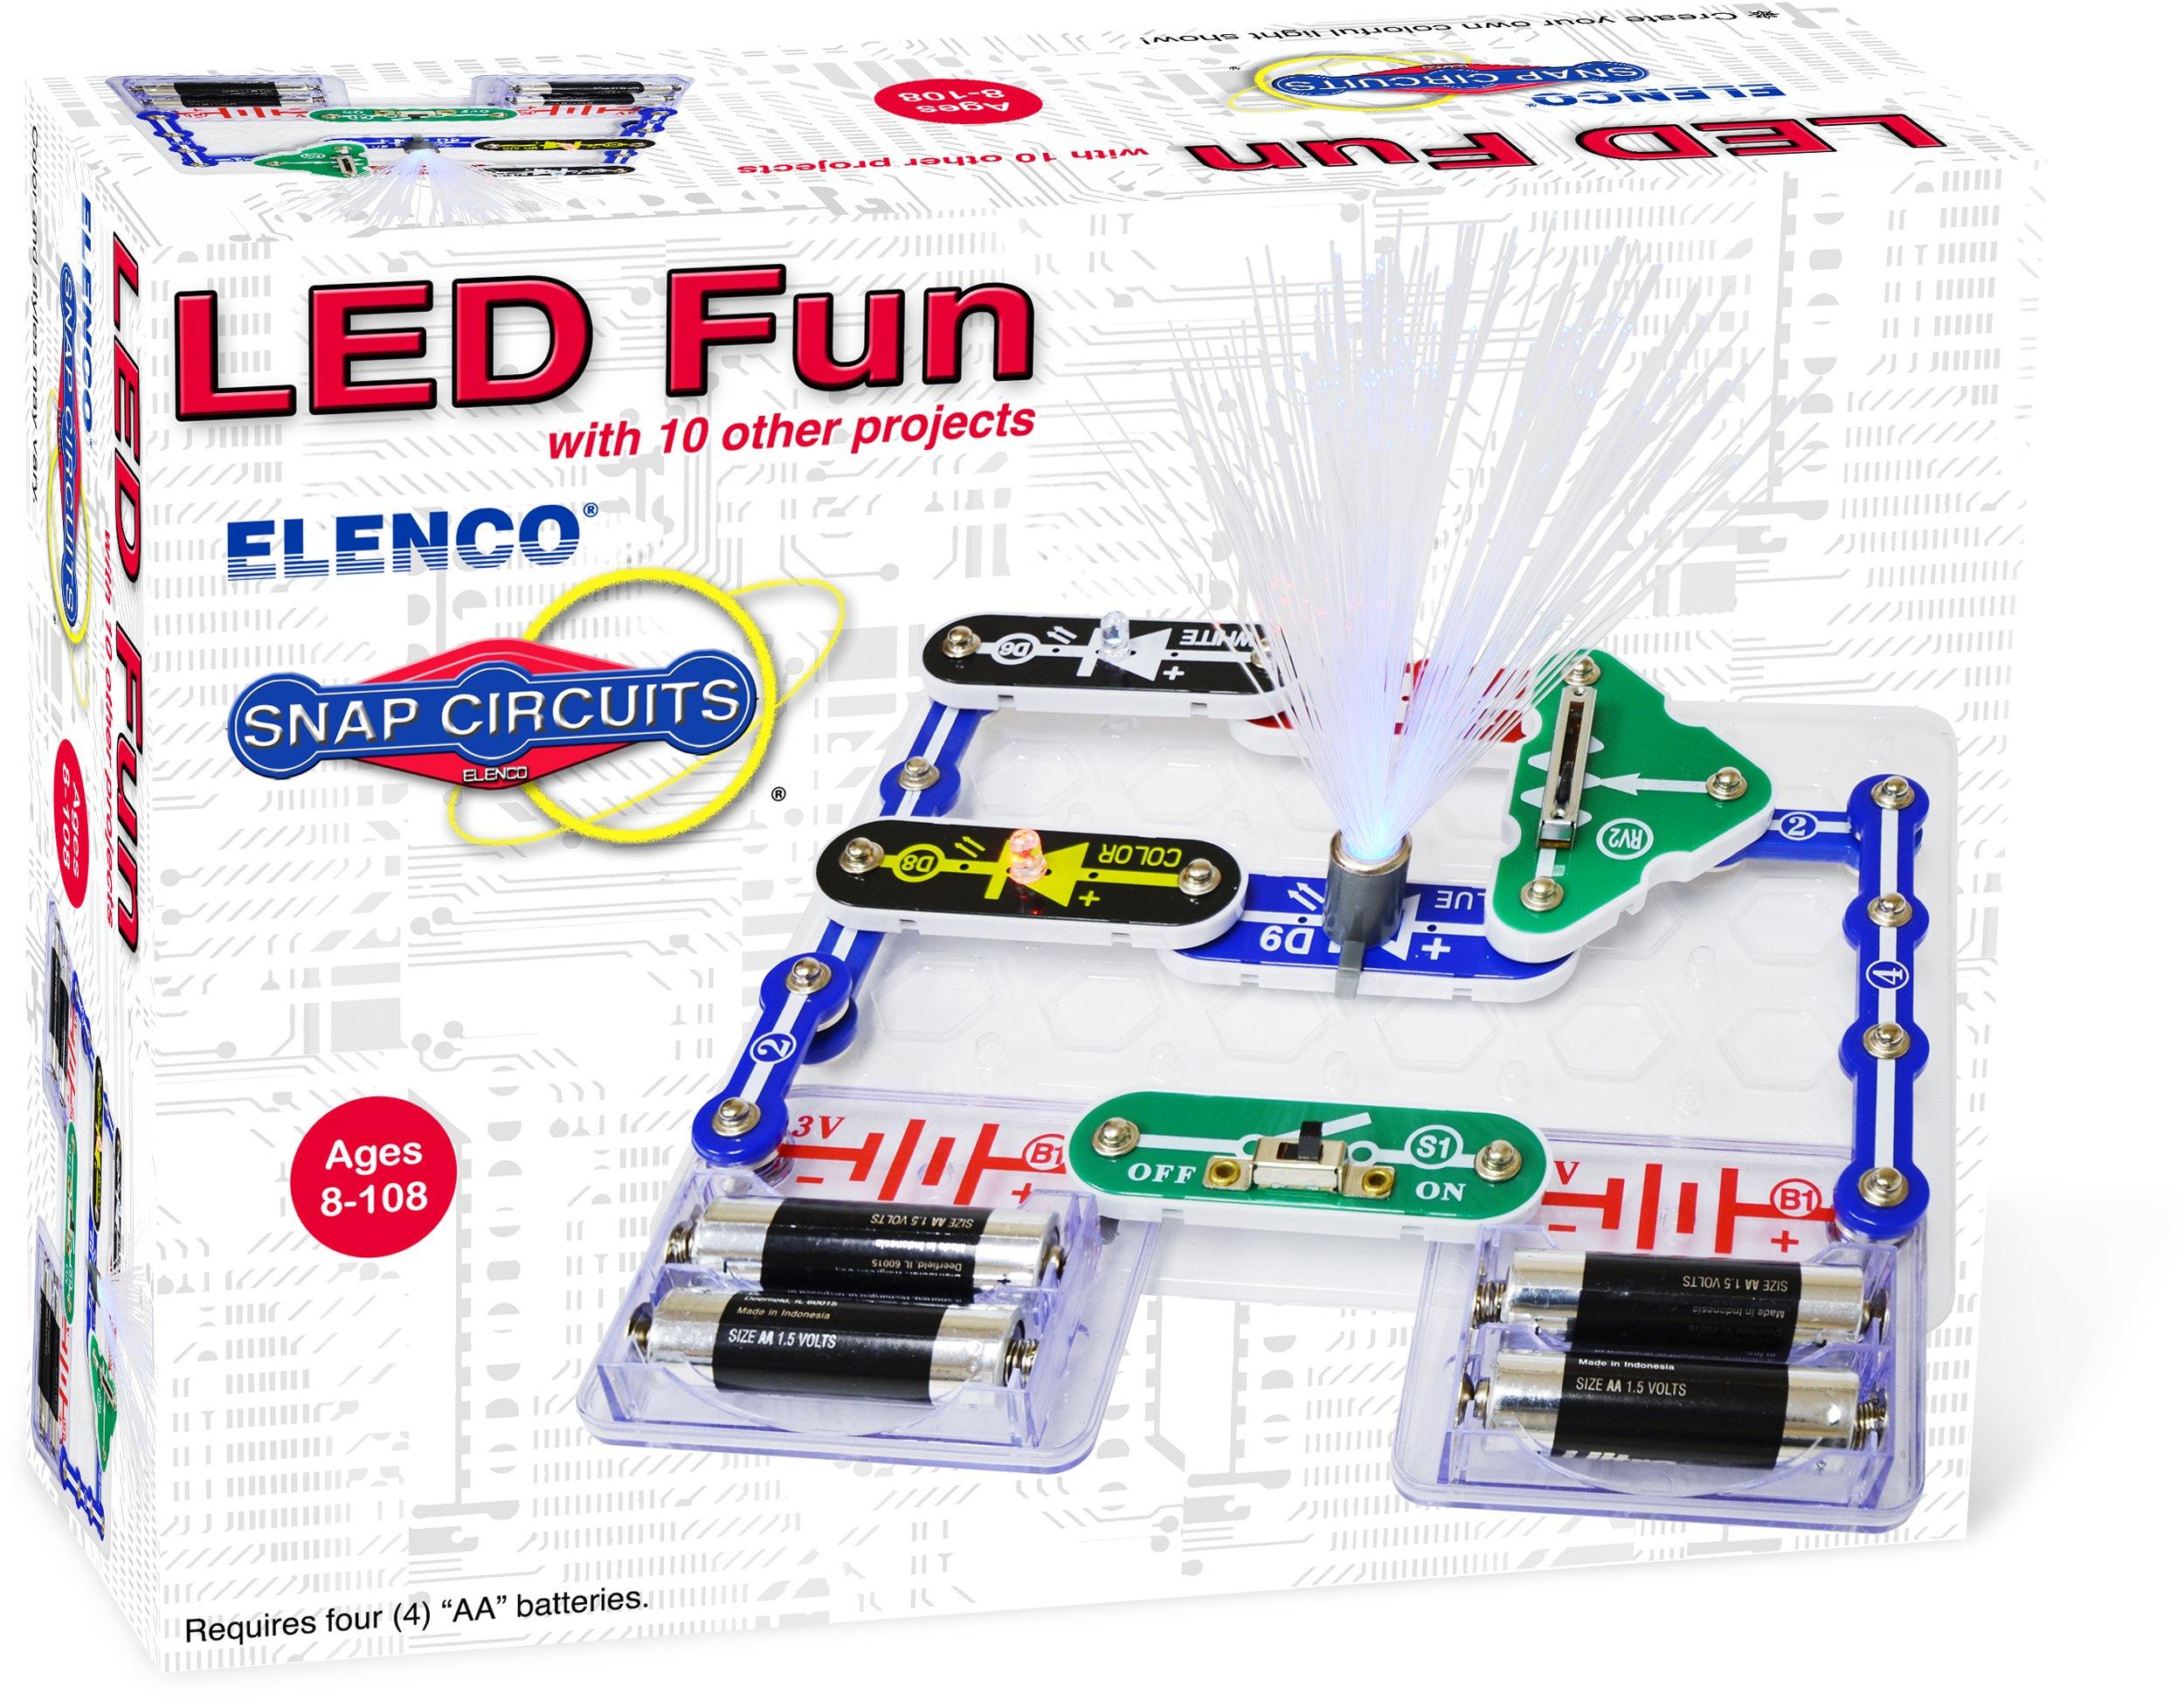 Elenco Electronics SCP-11 Snap Circuits LED Fun Science Kit by Elenco